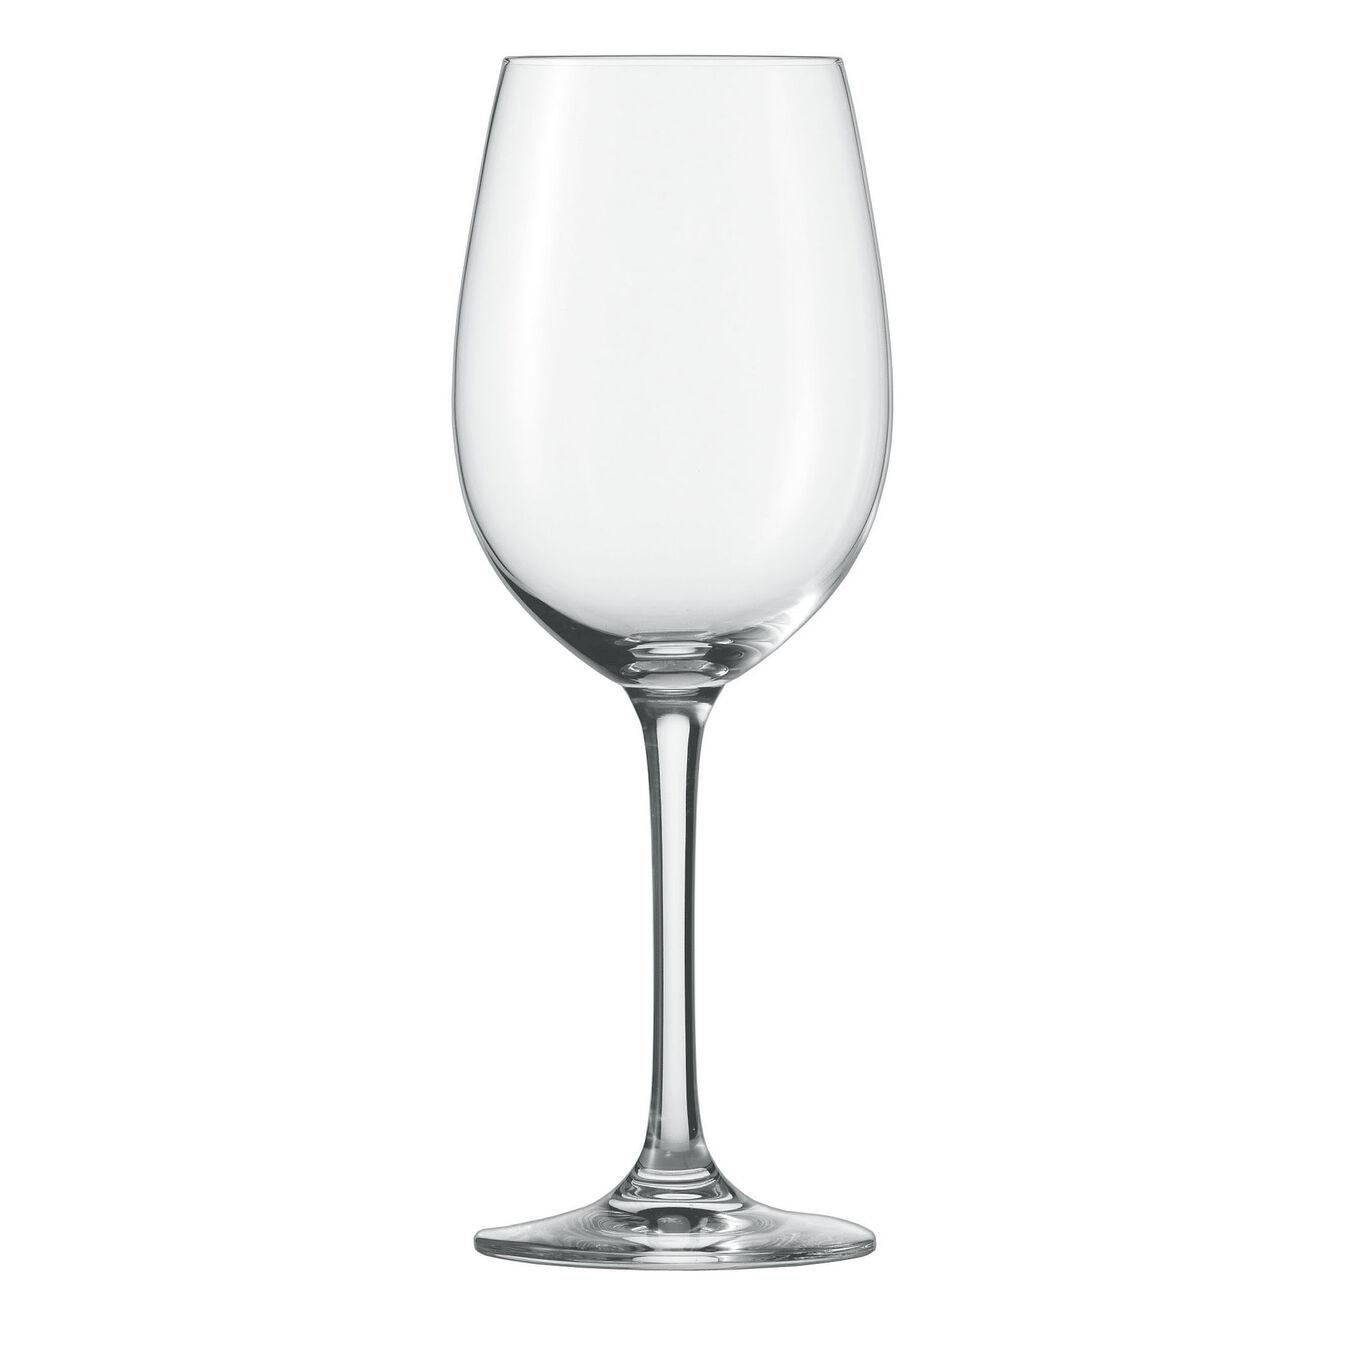 Taça para vinho tinto 540 ml,,large 1